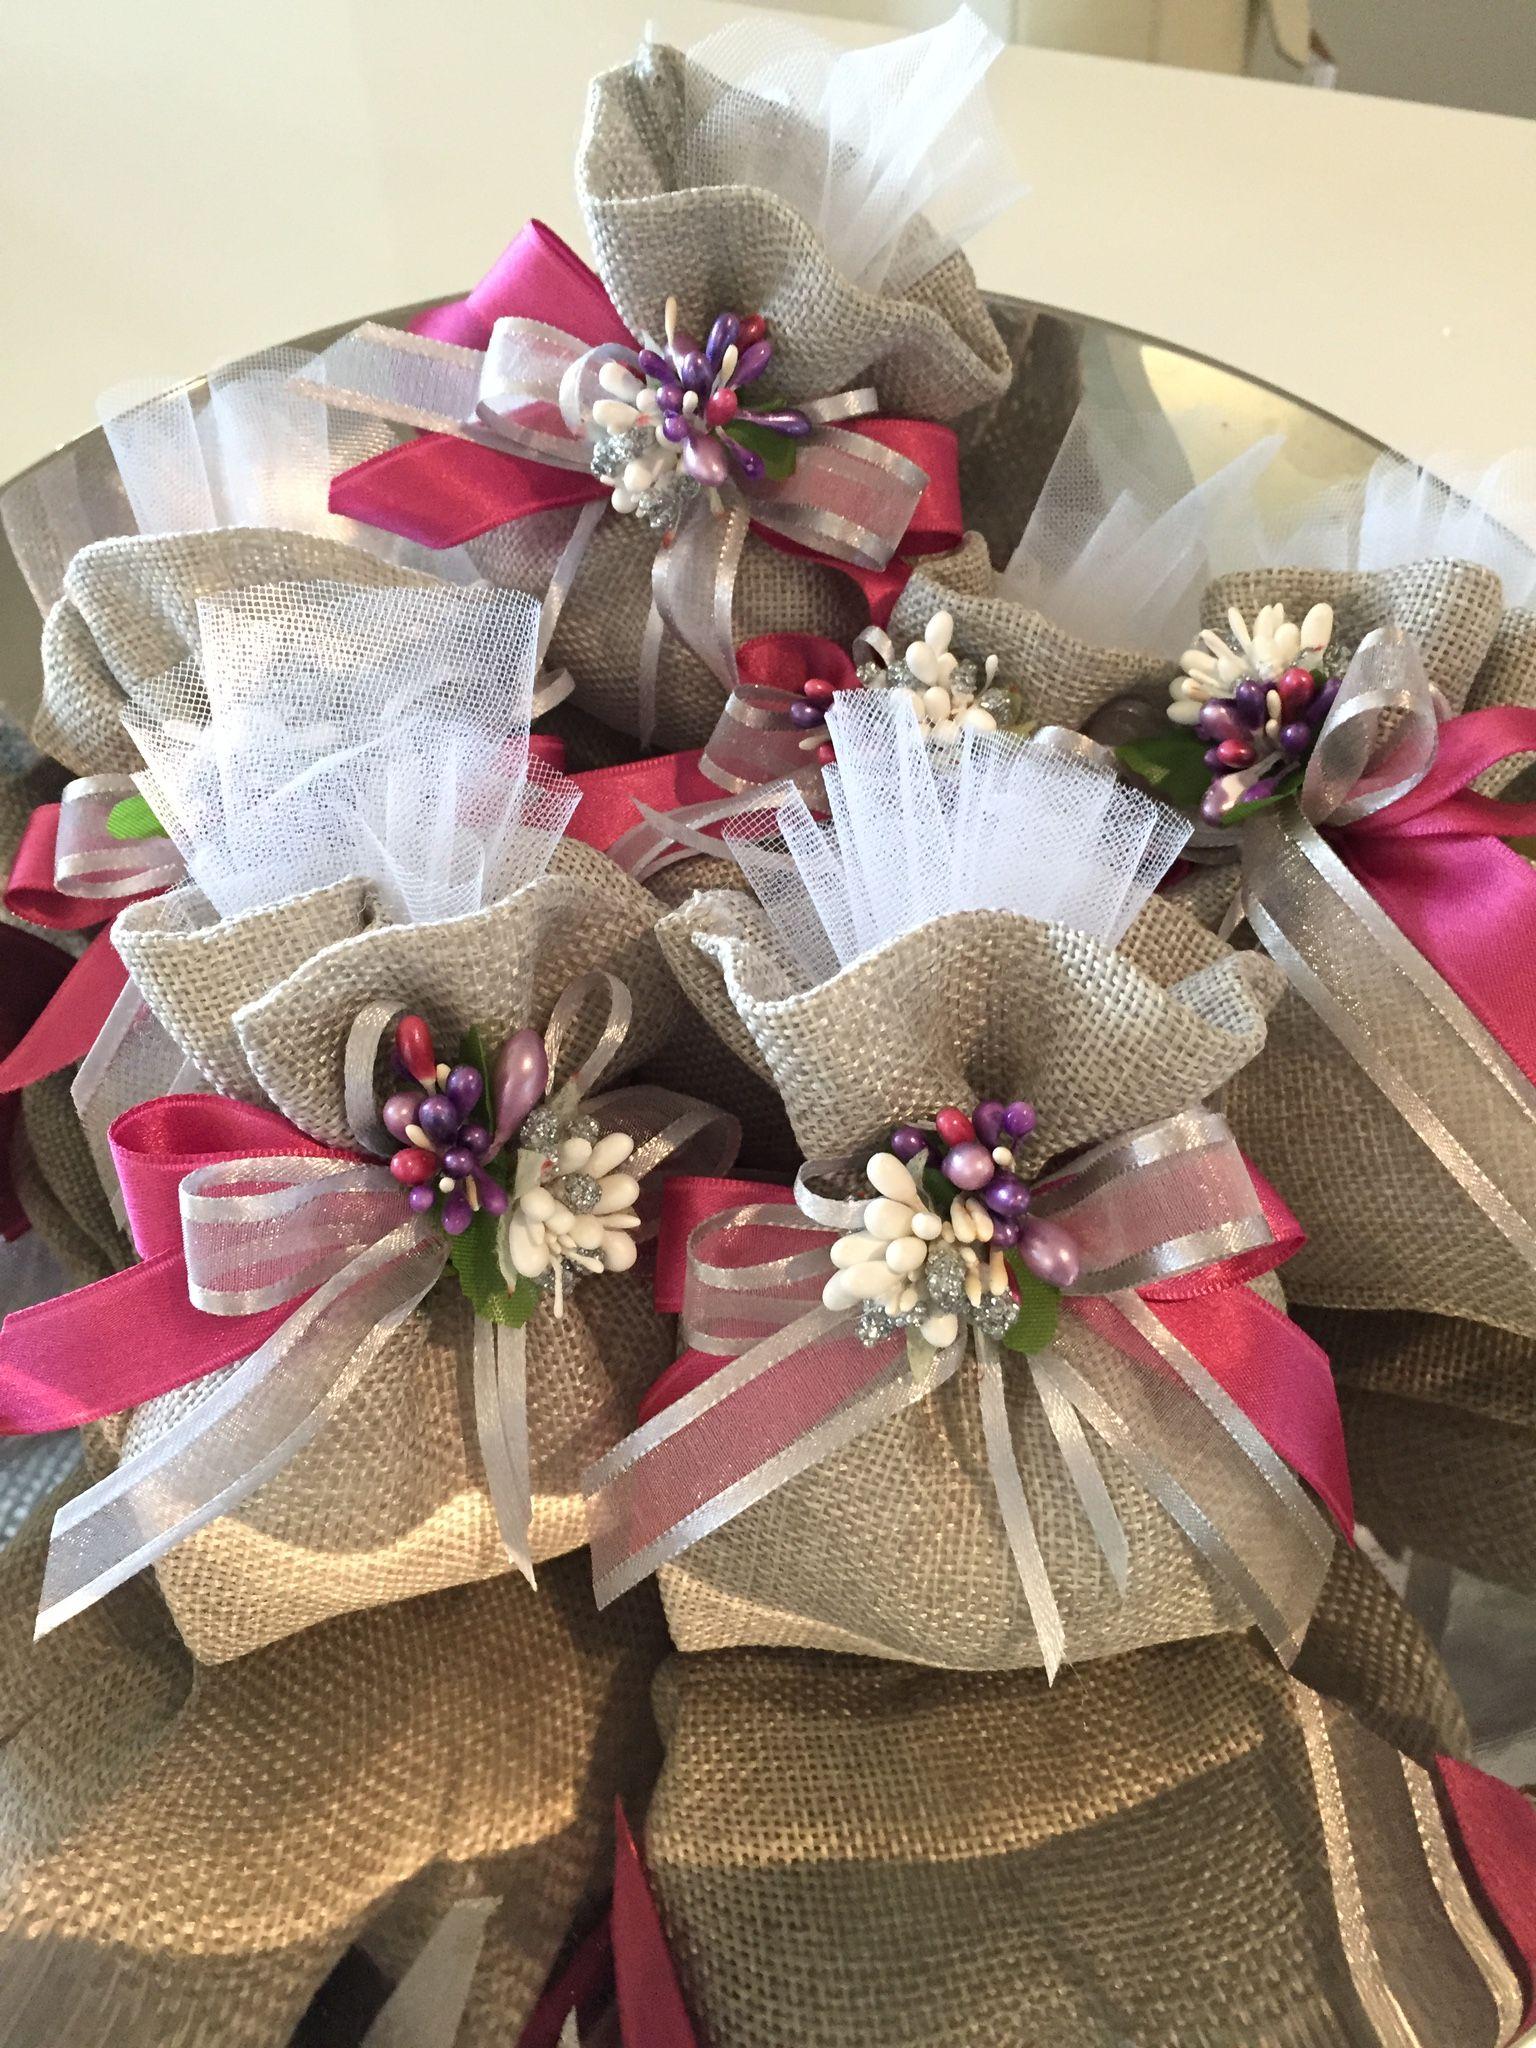 Pin de elitefavours en favours and gifts pinterest recuerdos yute y regalitos - Manualidades regalo boda ...